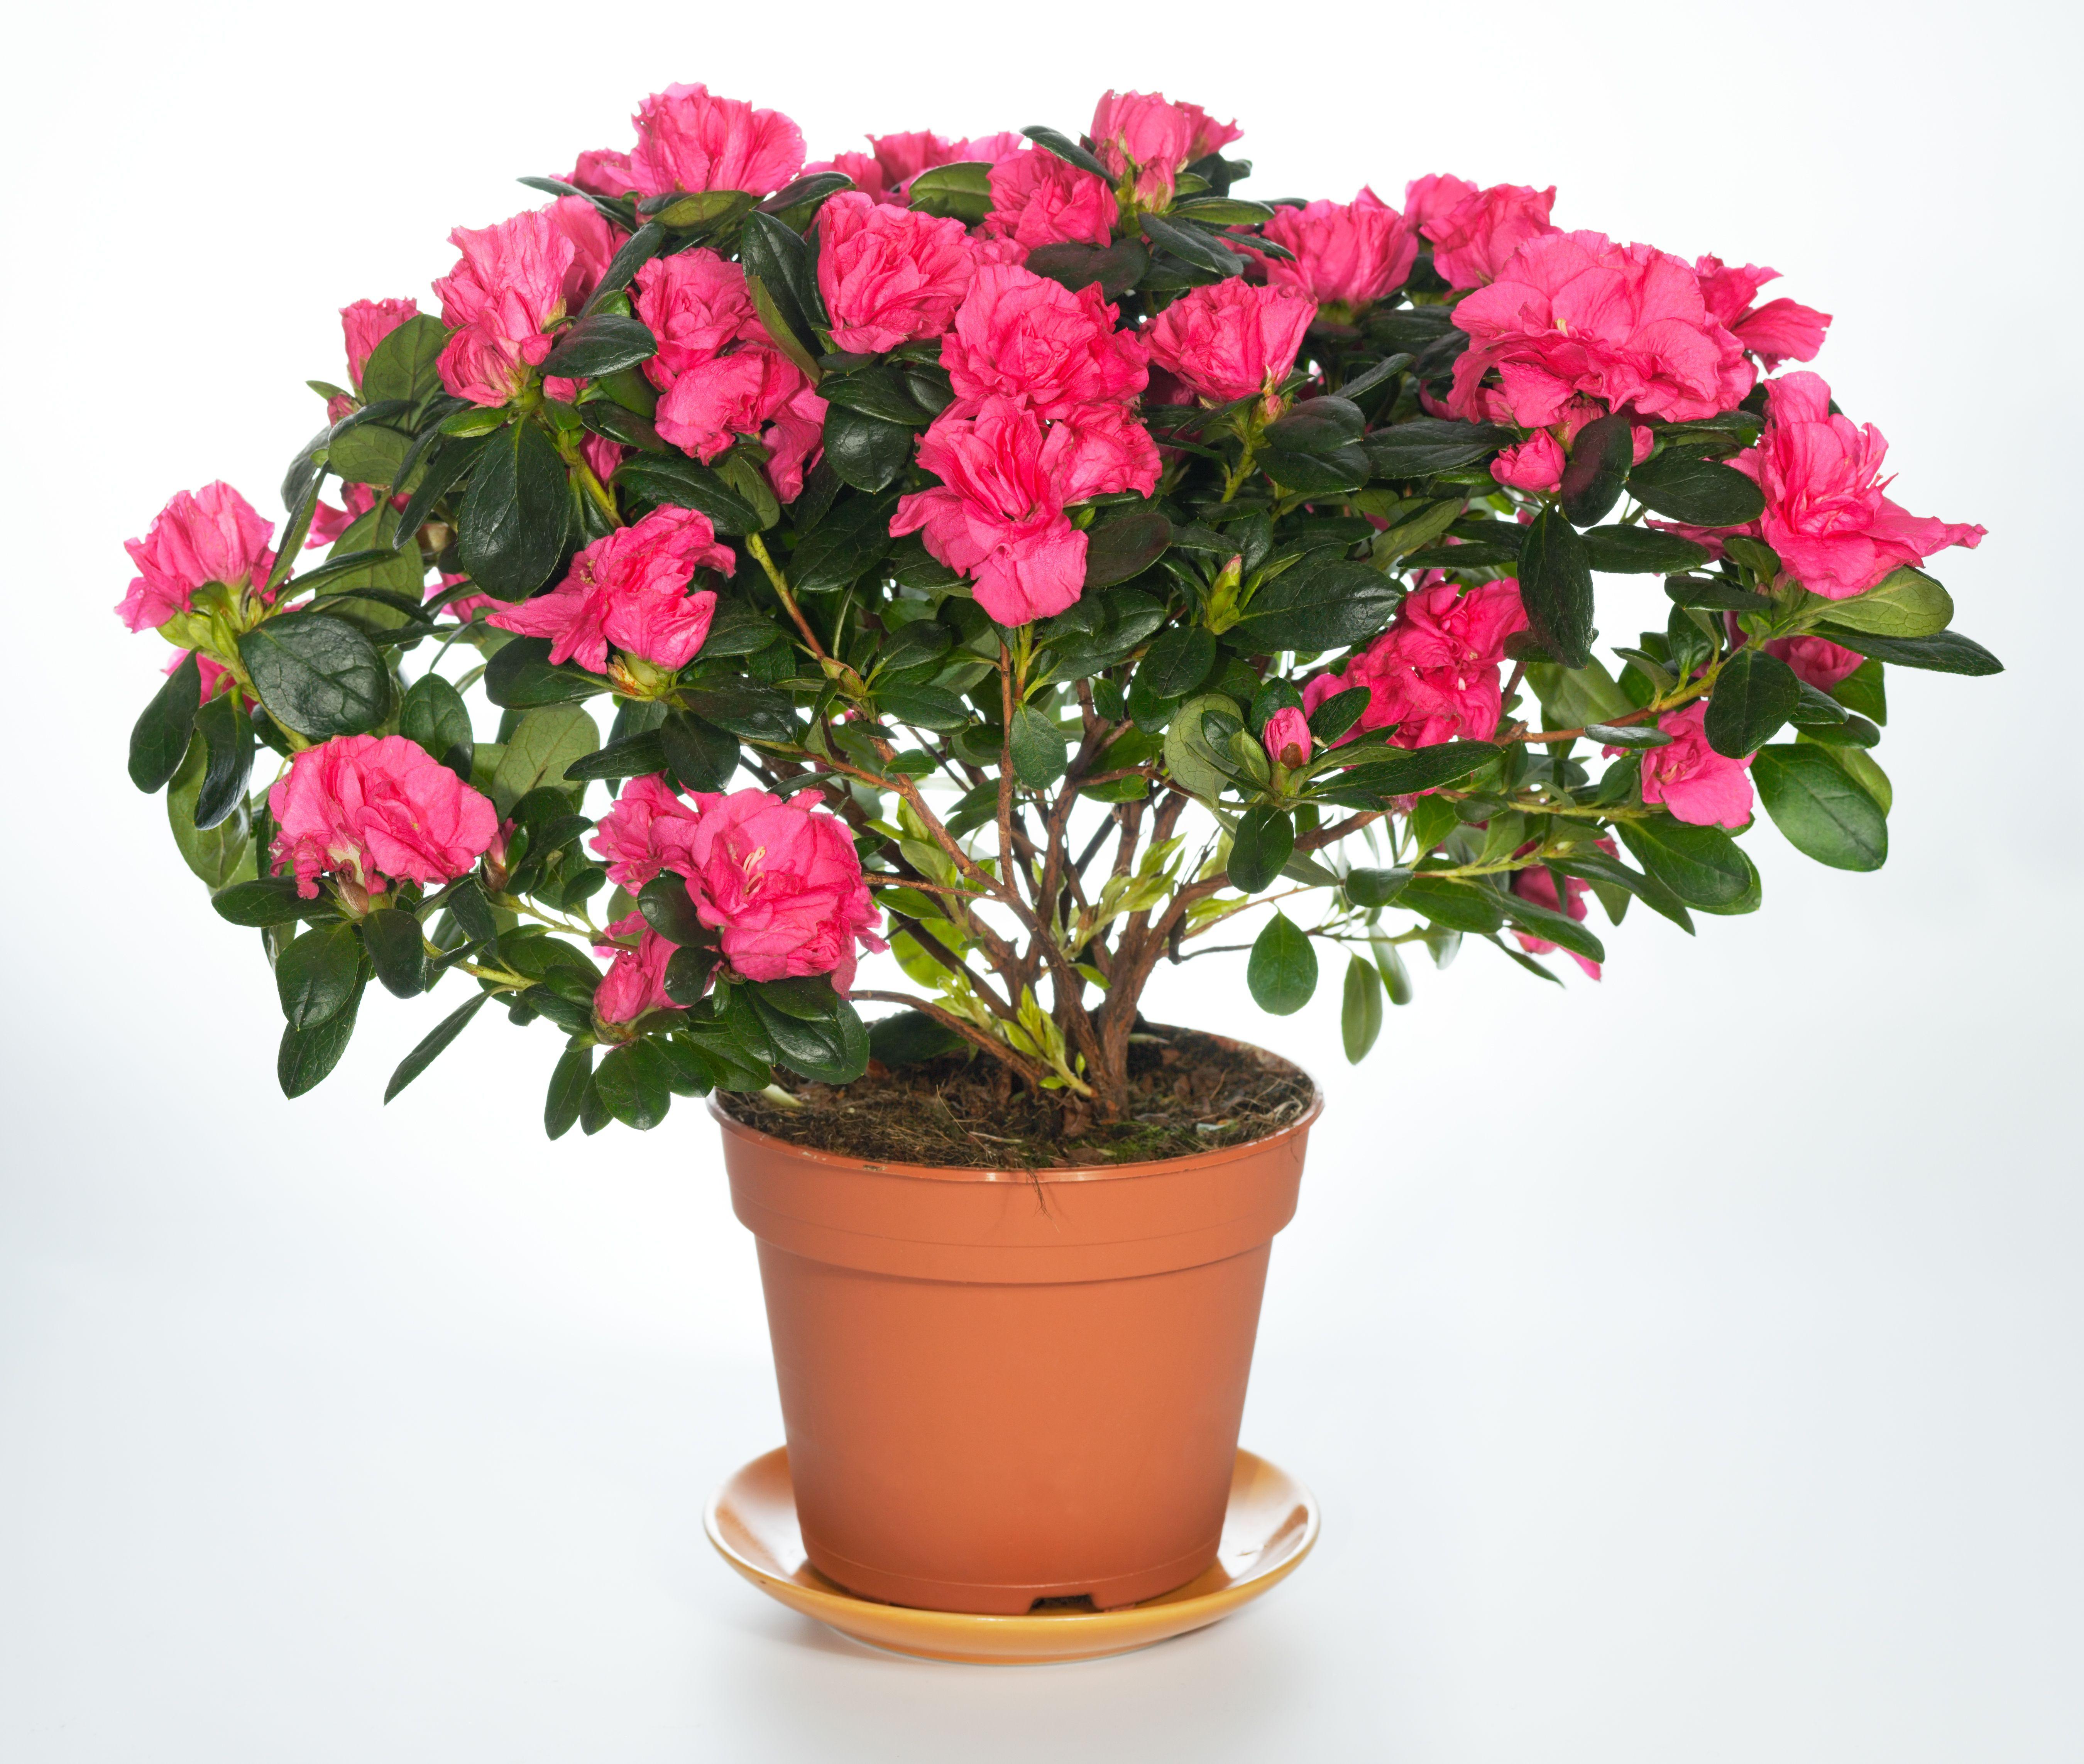 Flori Azalee Ingrijire Inmultire Azalee De Gradina Sau Ghiveci Azaleas Care Where To Buy Flowers Plants